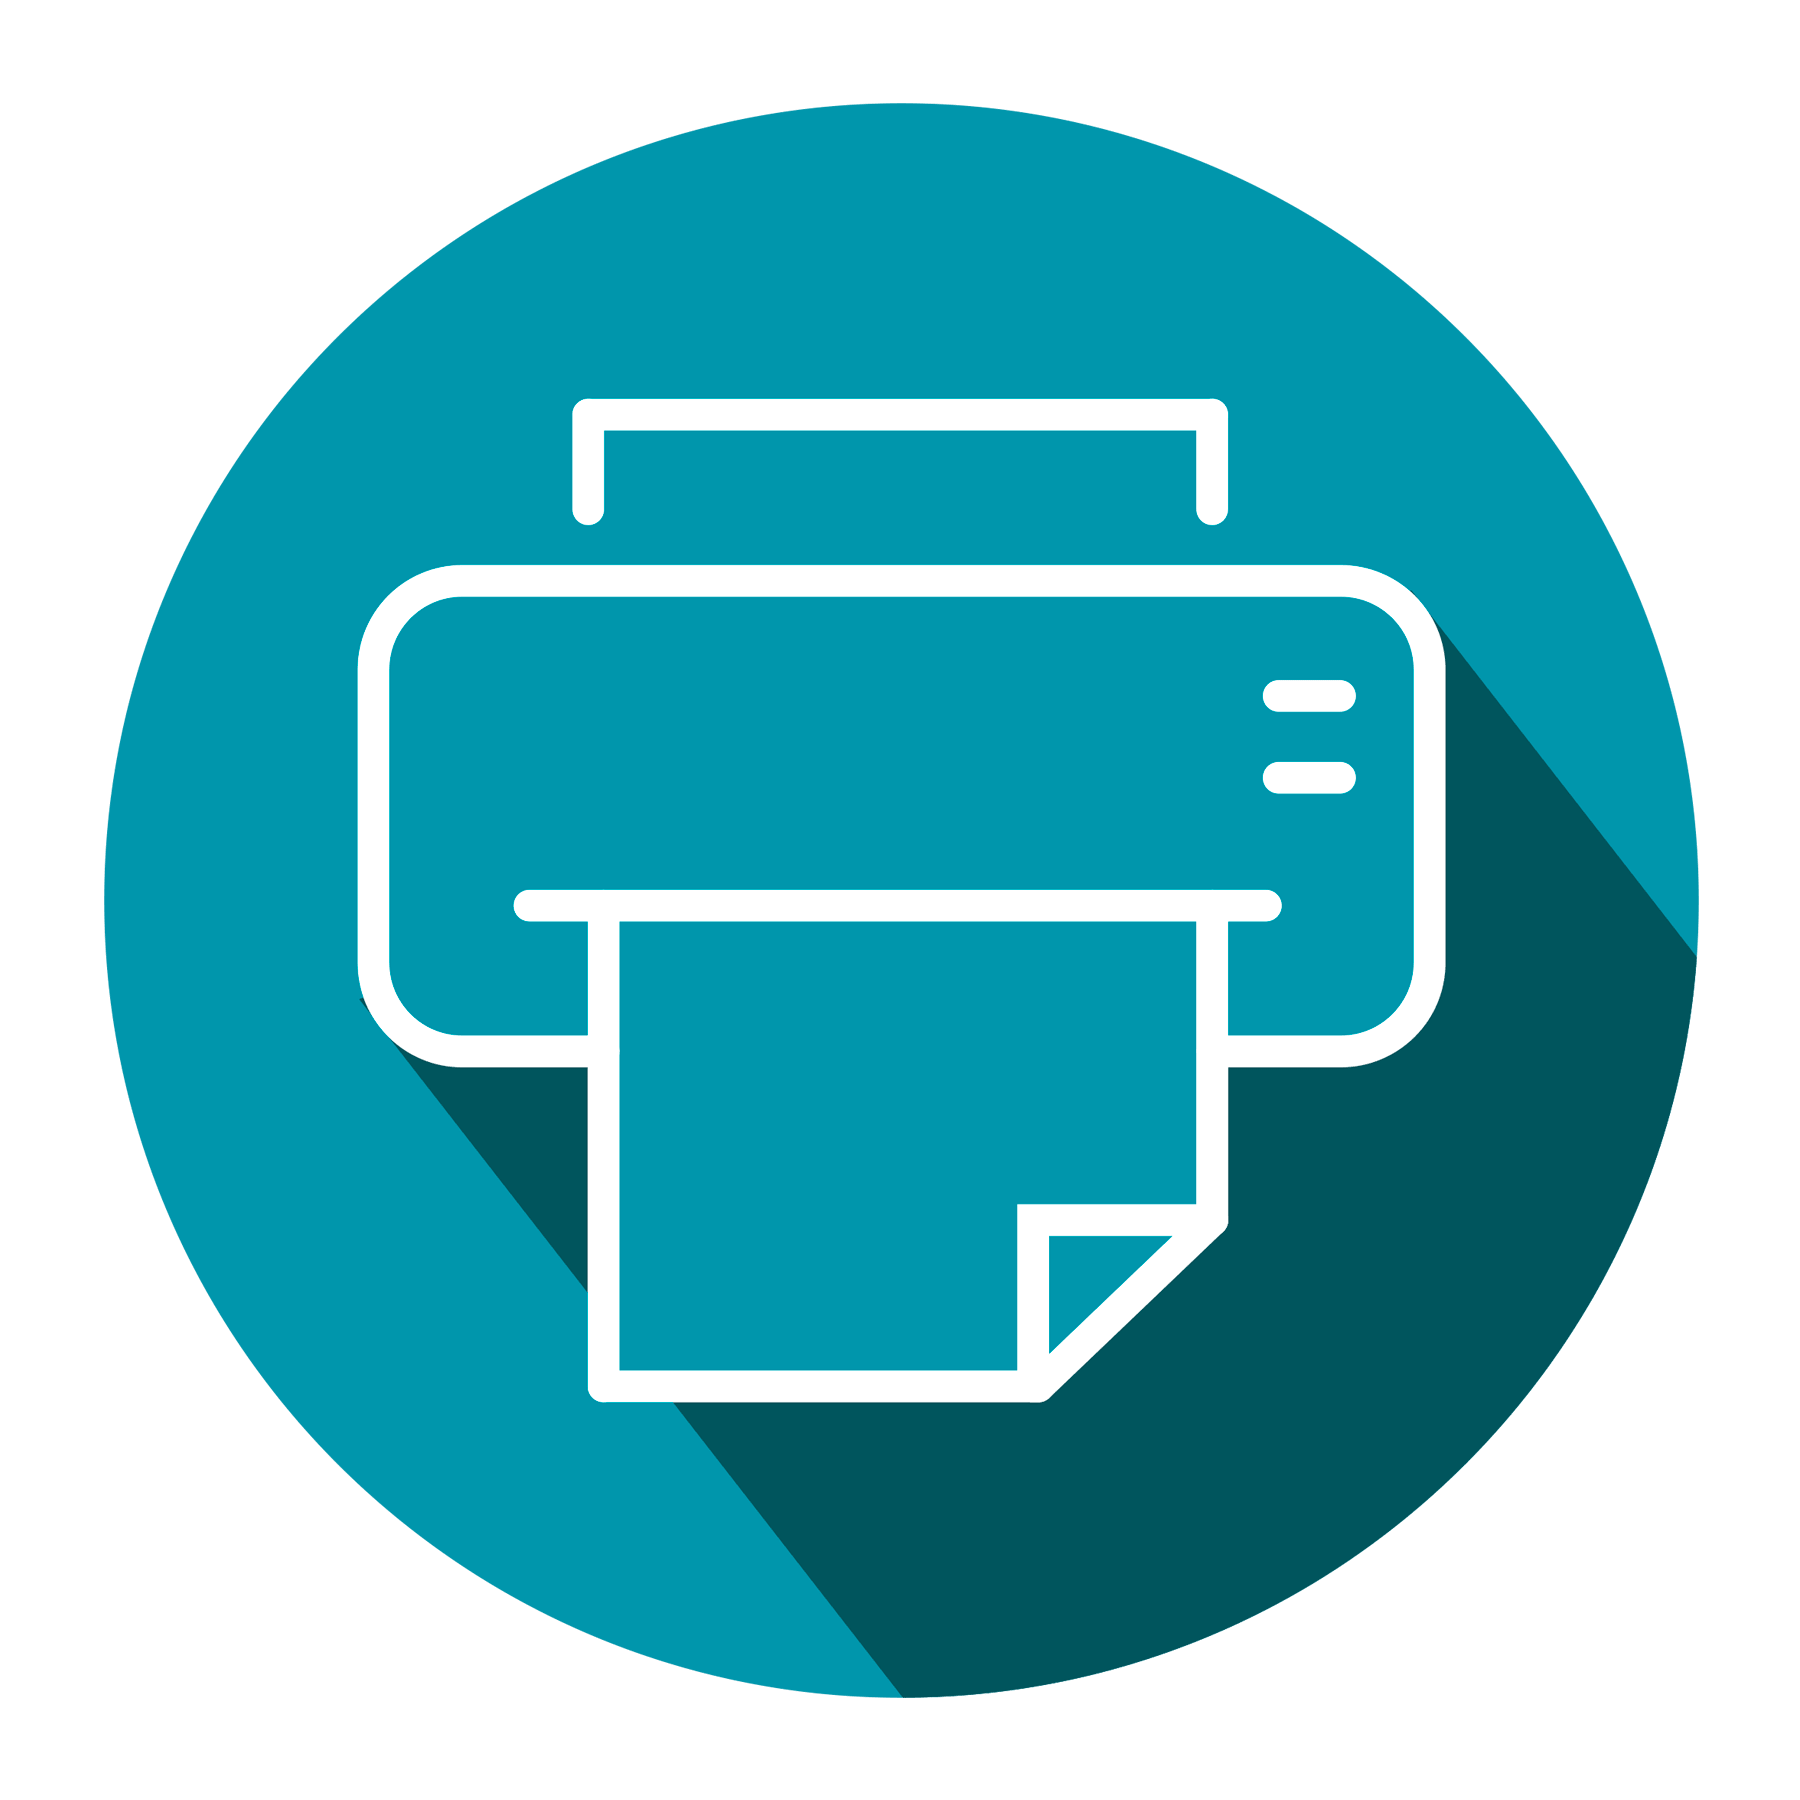 Servicios de impresión en digital - Dprint - Tu centro de impresión revolucionario